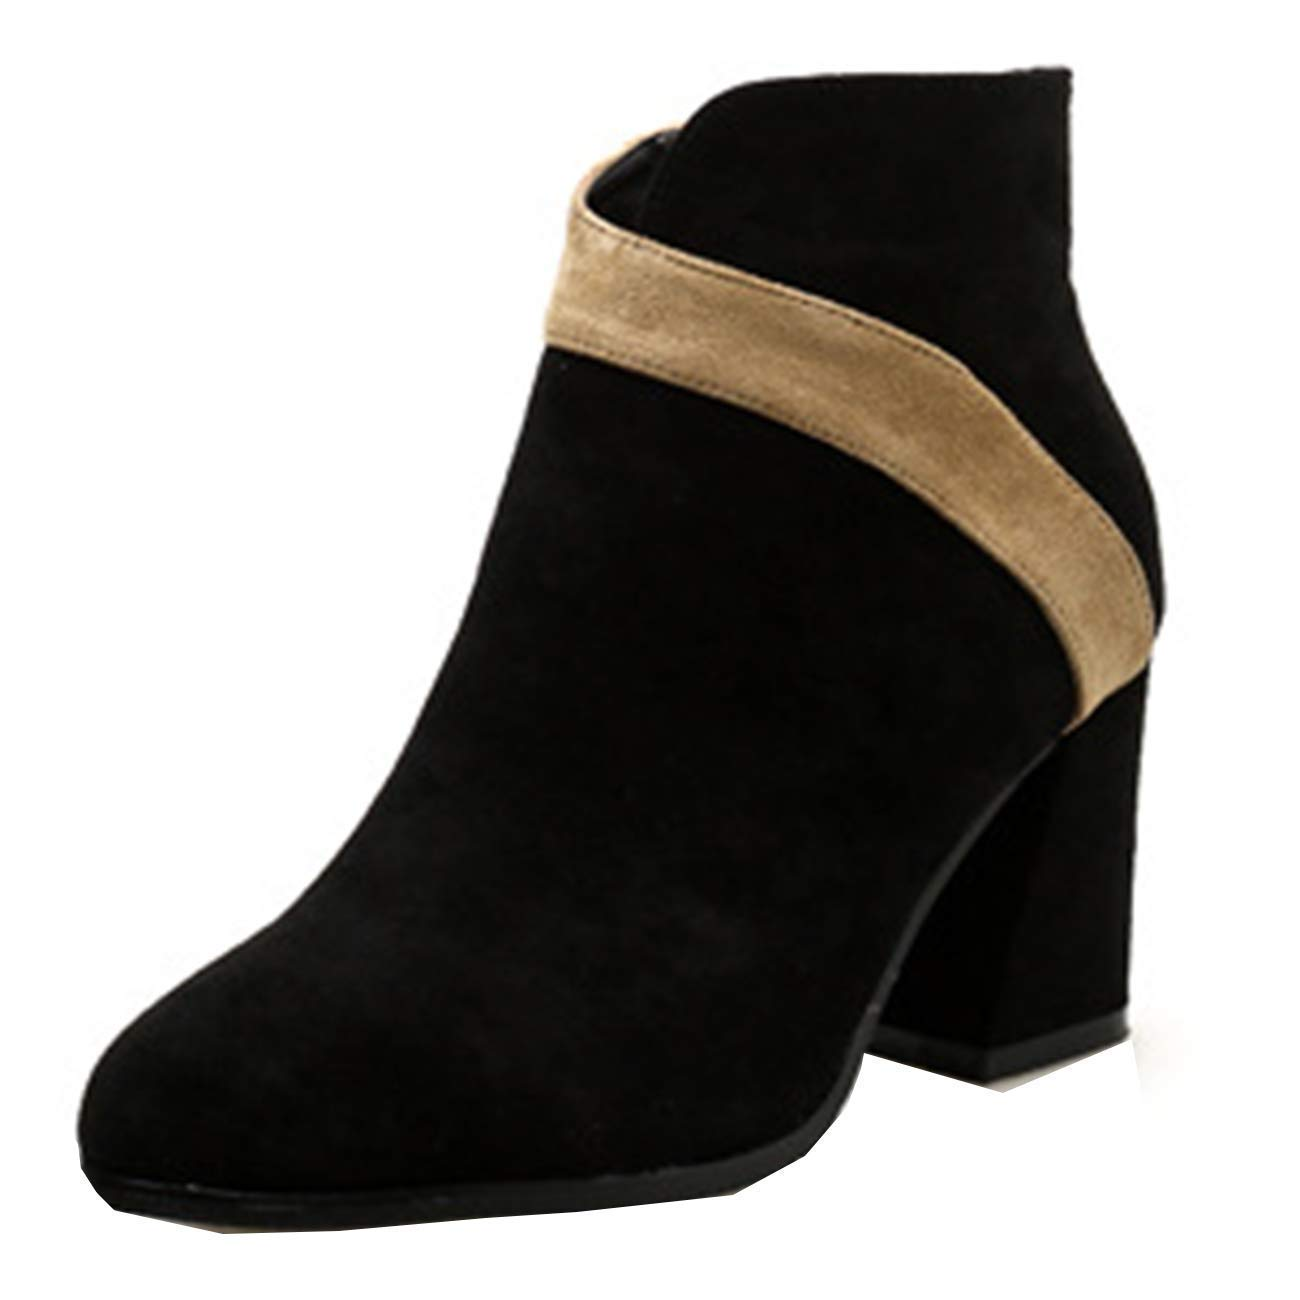 ZHRUI Damen Runde-Toe Block-Heel Zip Zip Zip Suede Ankle Stiefel (Farbe   Schwarz, Größe   2 UK) a19c6a